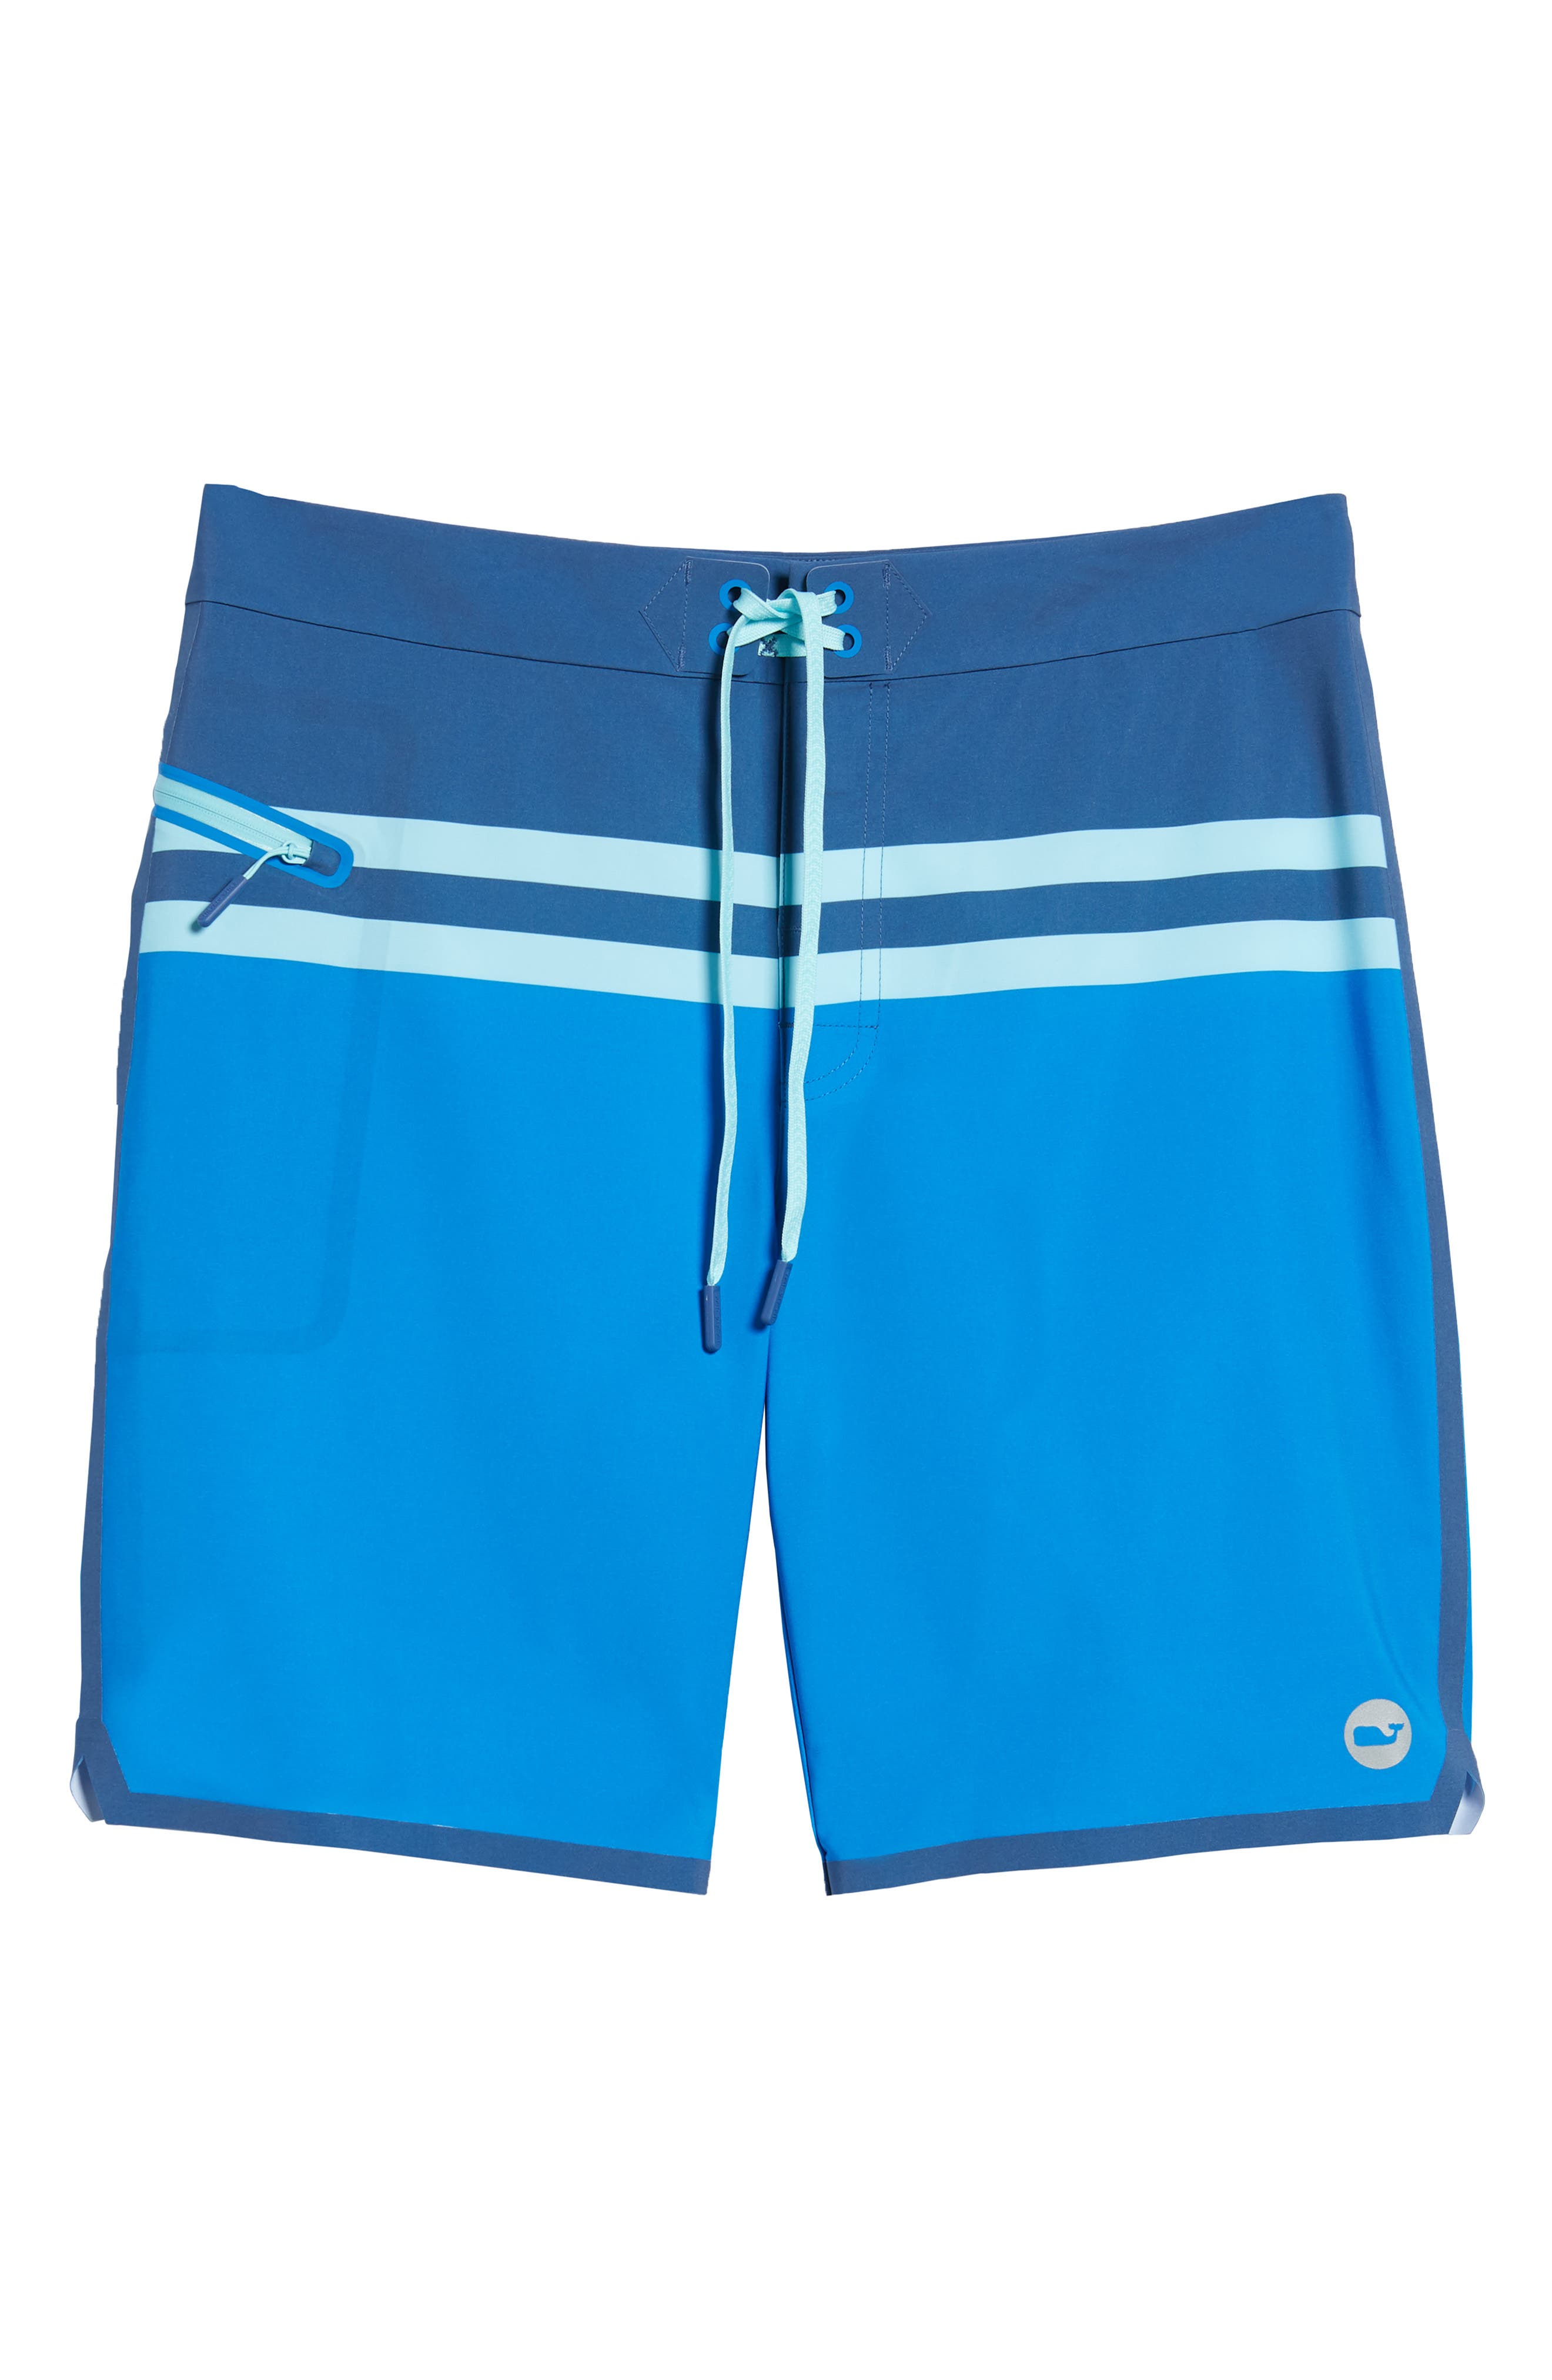 Bay Ridge Board Shorts,                             Alternate thumbnail 6, color,